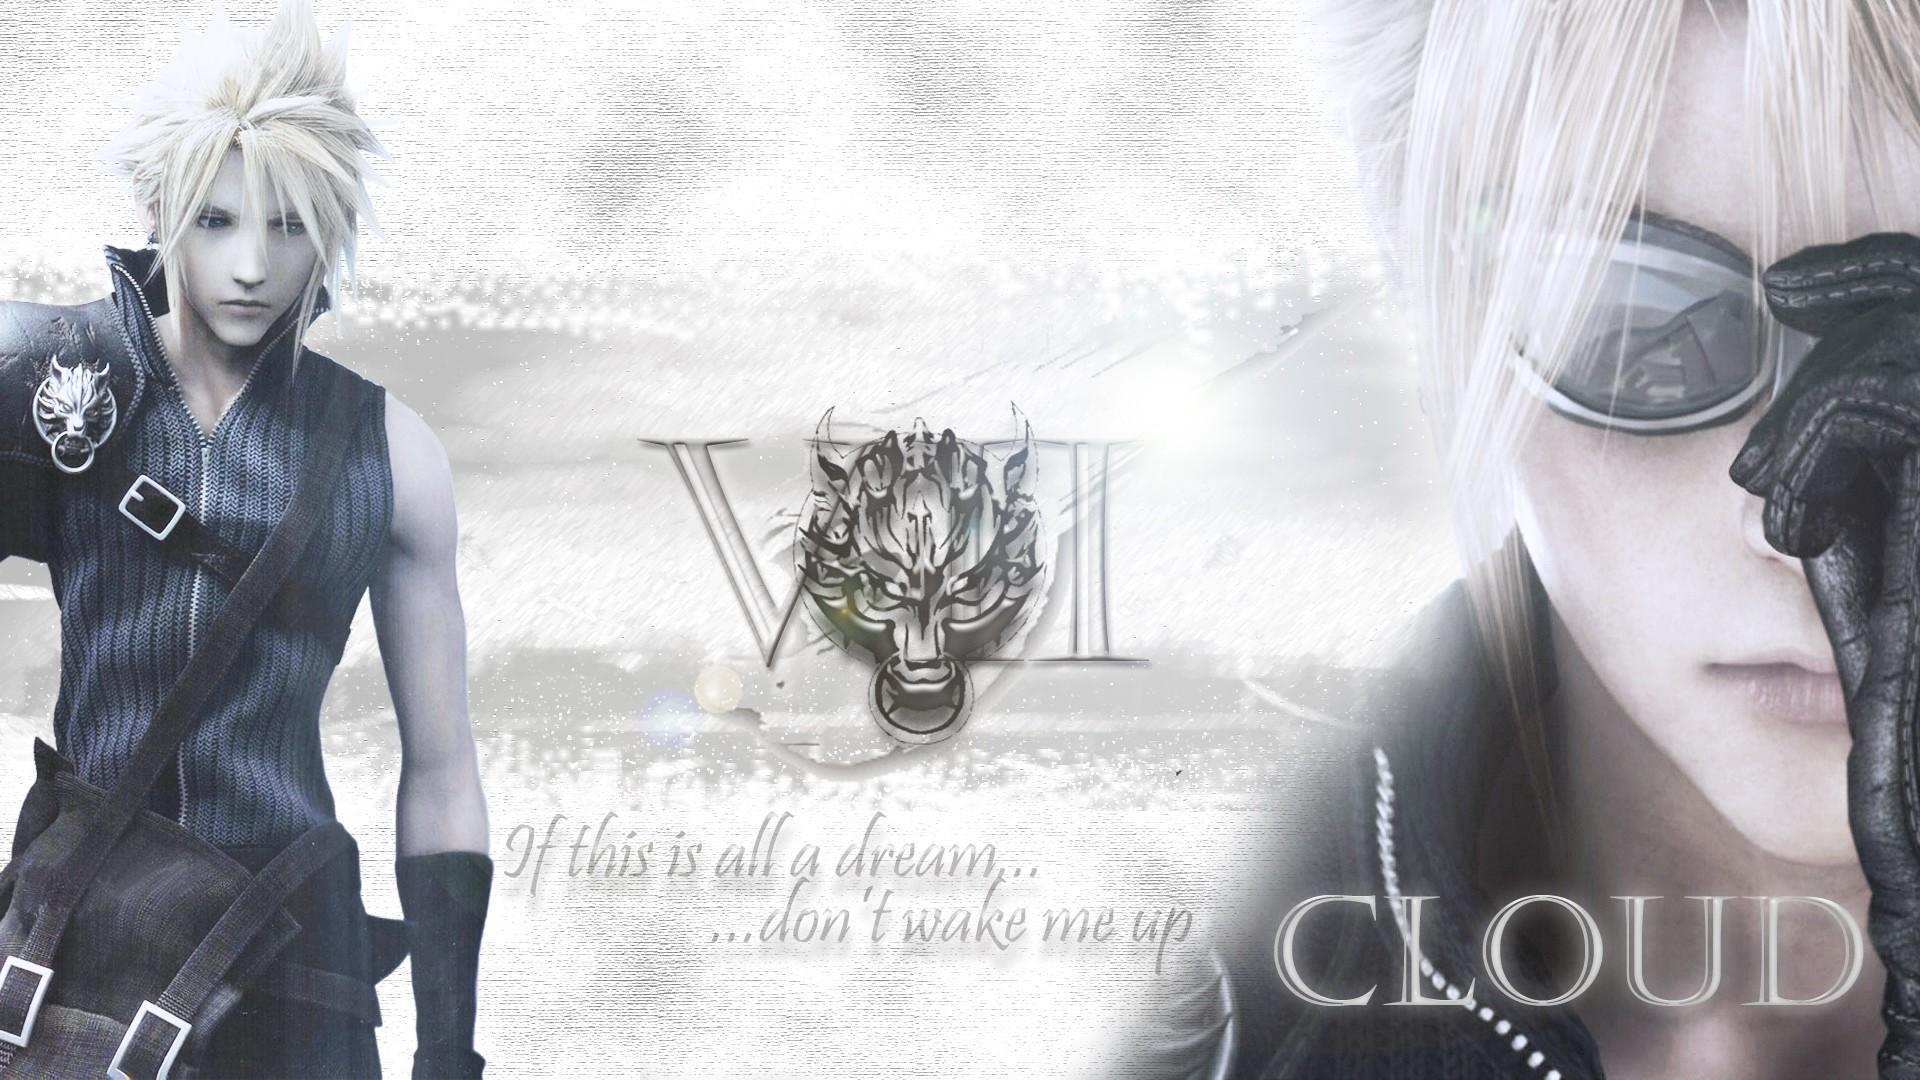 Final Fantasy, Cloud Strife, Final Fantasy VII, Video Games, Square Enix  Wallpapers HD / Desktop and Mobile Backgrounds